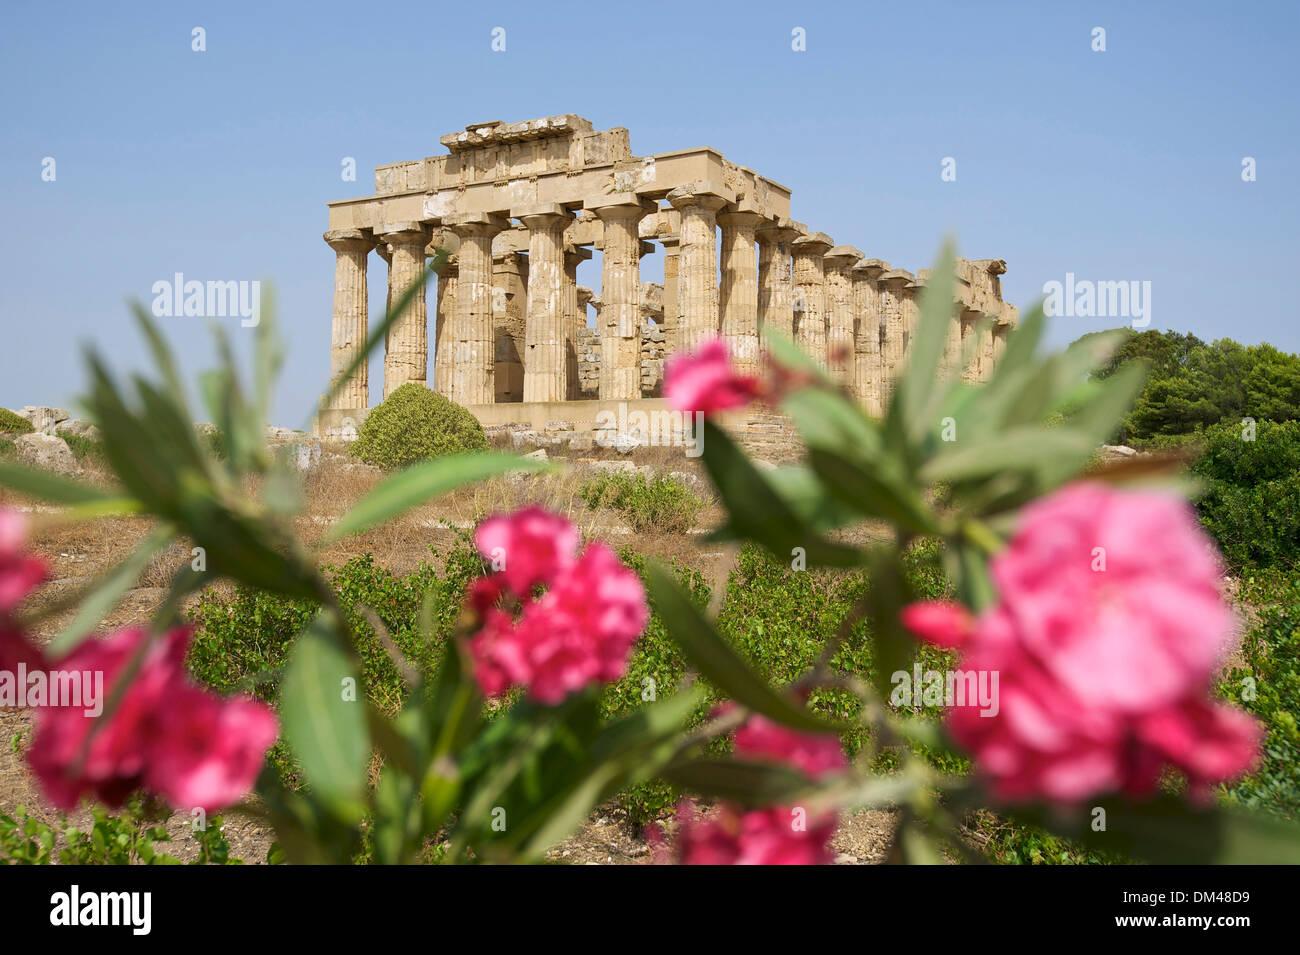 Italien-Sizilien-Süd-Italien-Europa Insel Tempel der Hera Selinunt Tempelarchitektur Baugeschichte historische Gebäude Stockbild